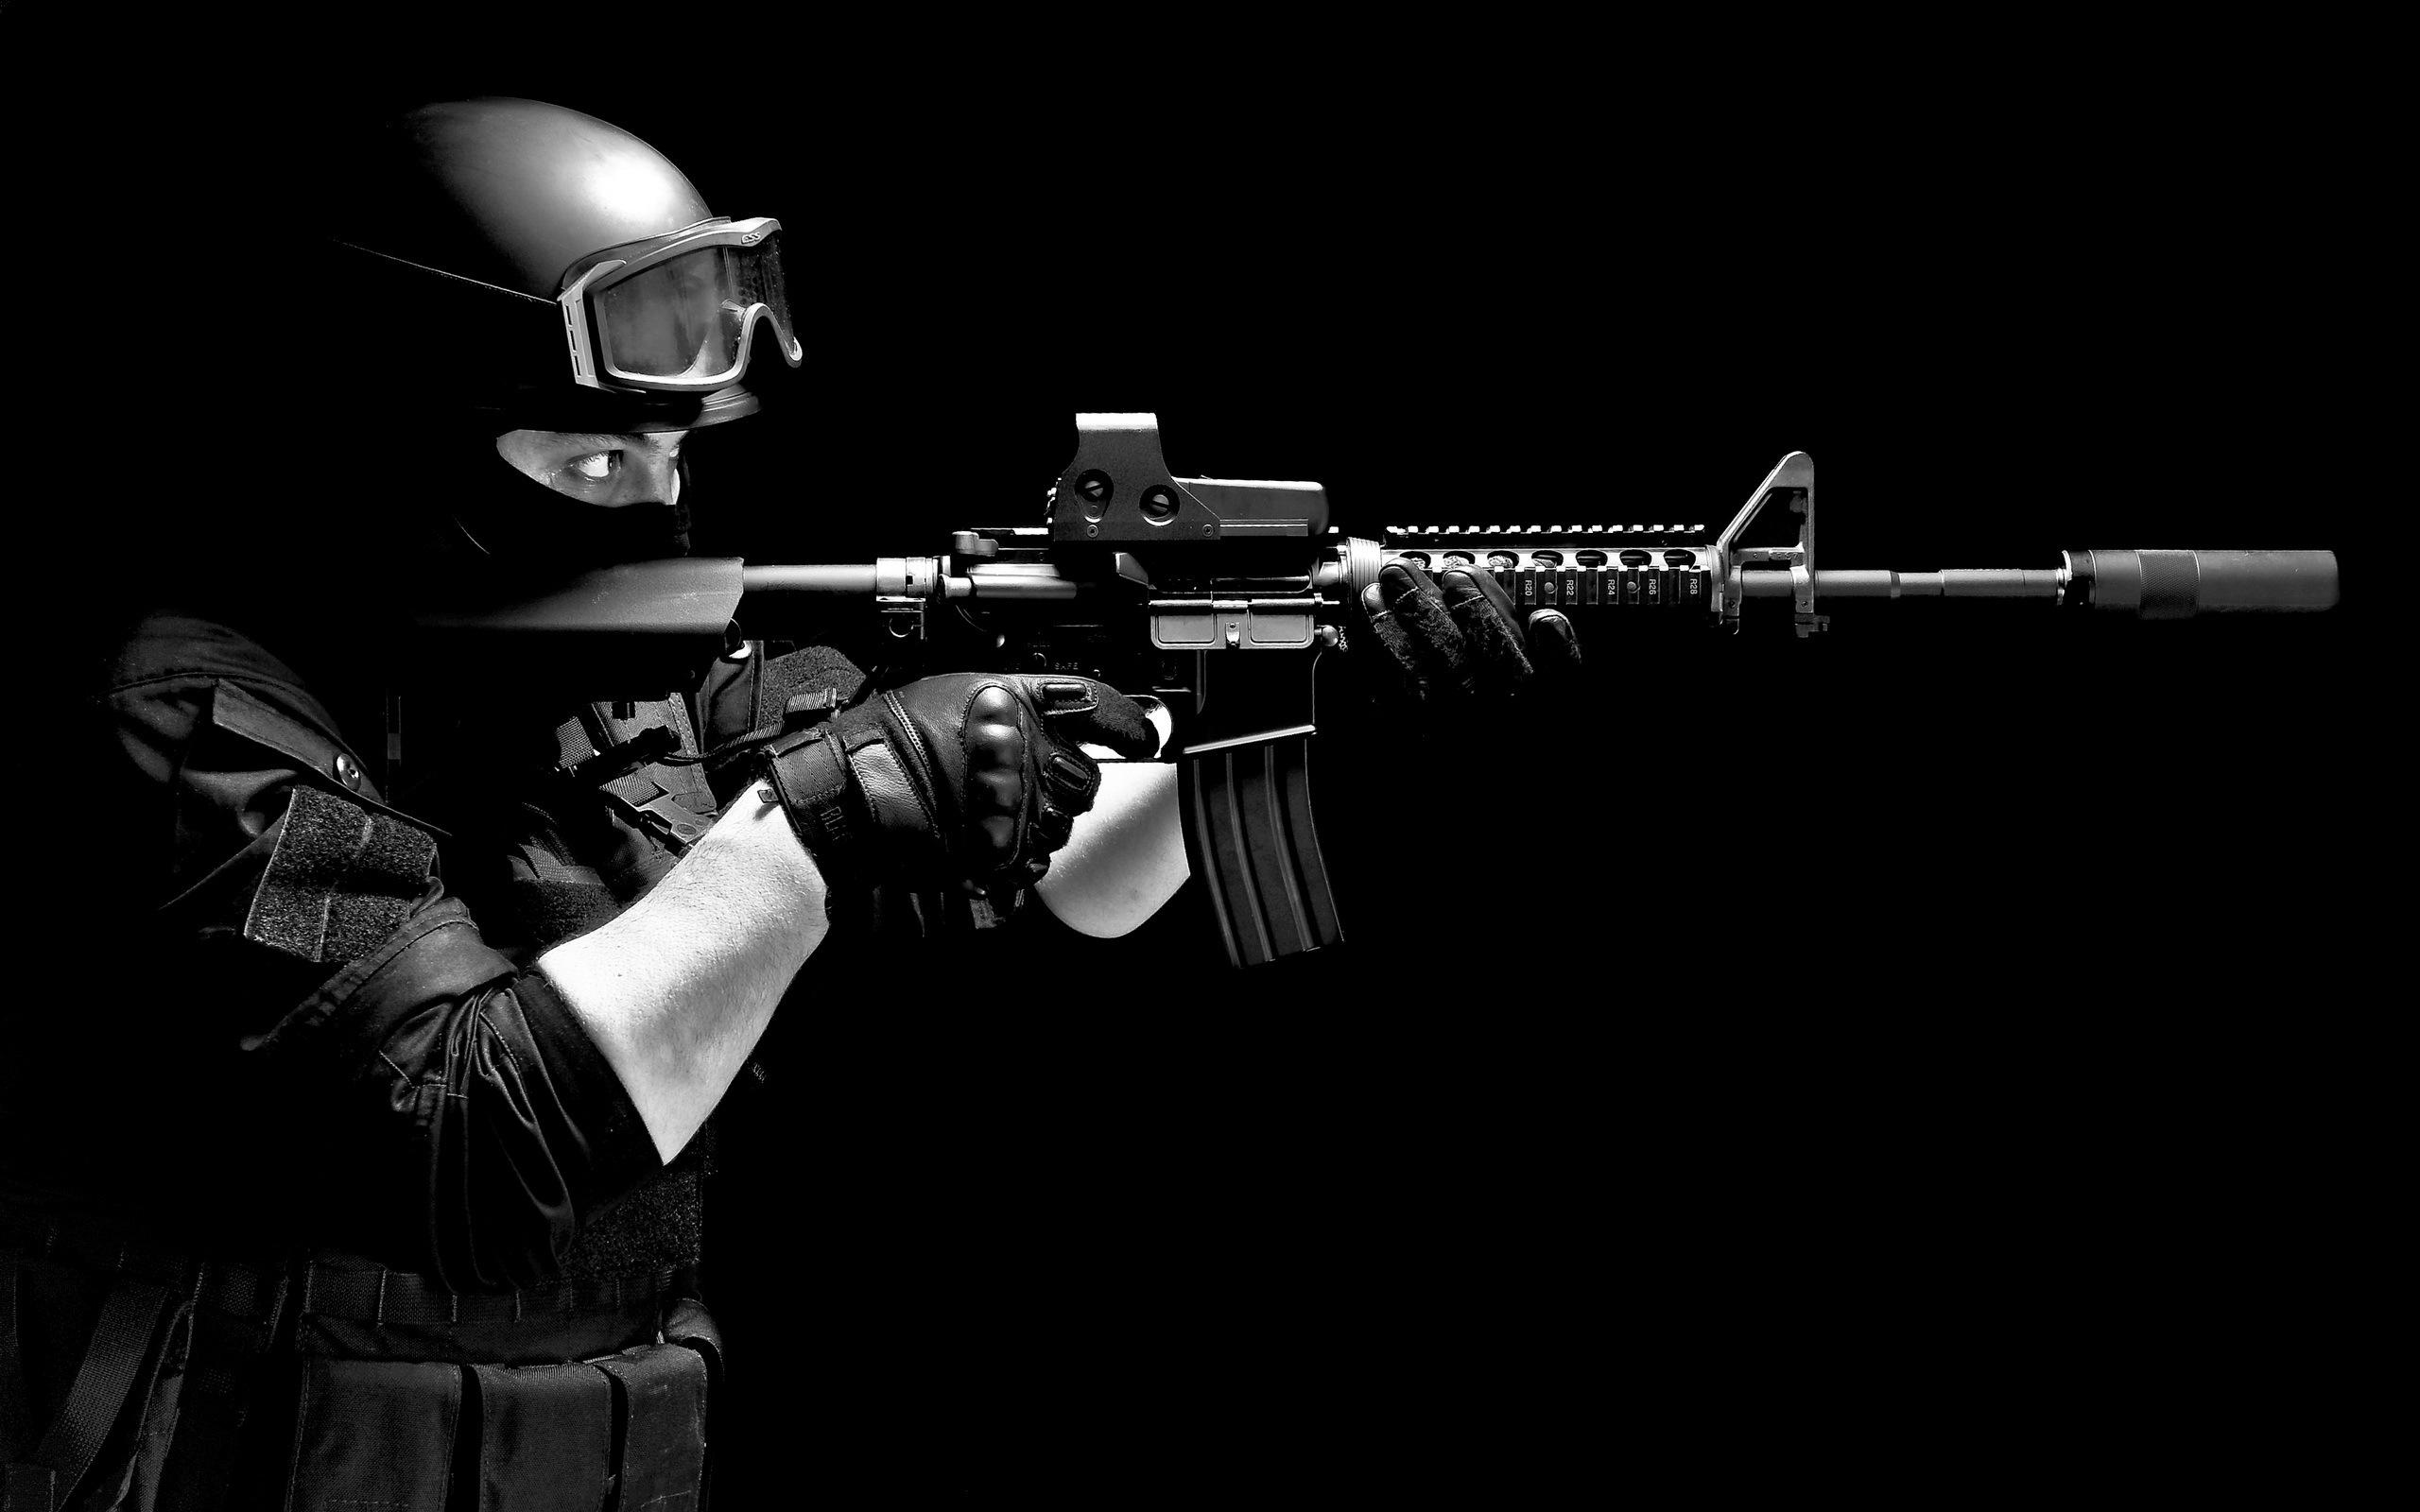 Sniper Rifle Snipers Artwork Wallpapers Hd Desktop And: American Sniper Wallpapers